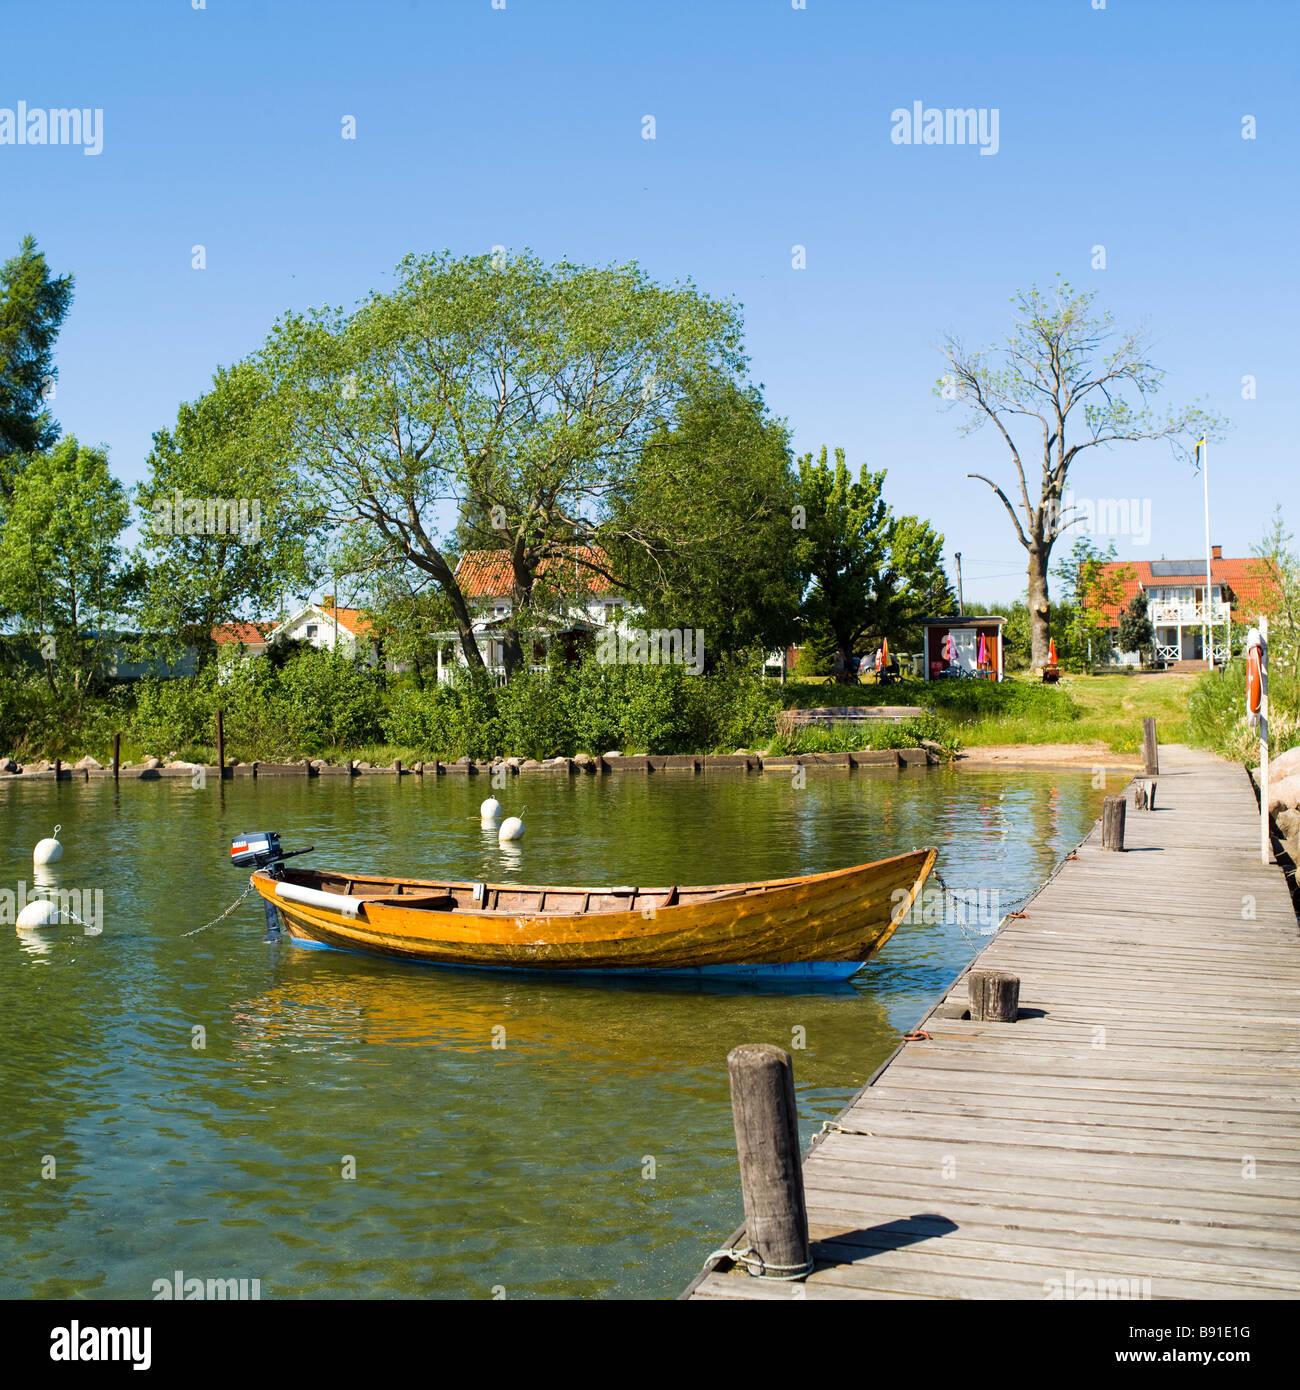 Boat - Stock Image